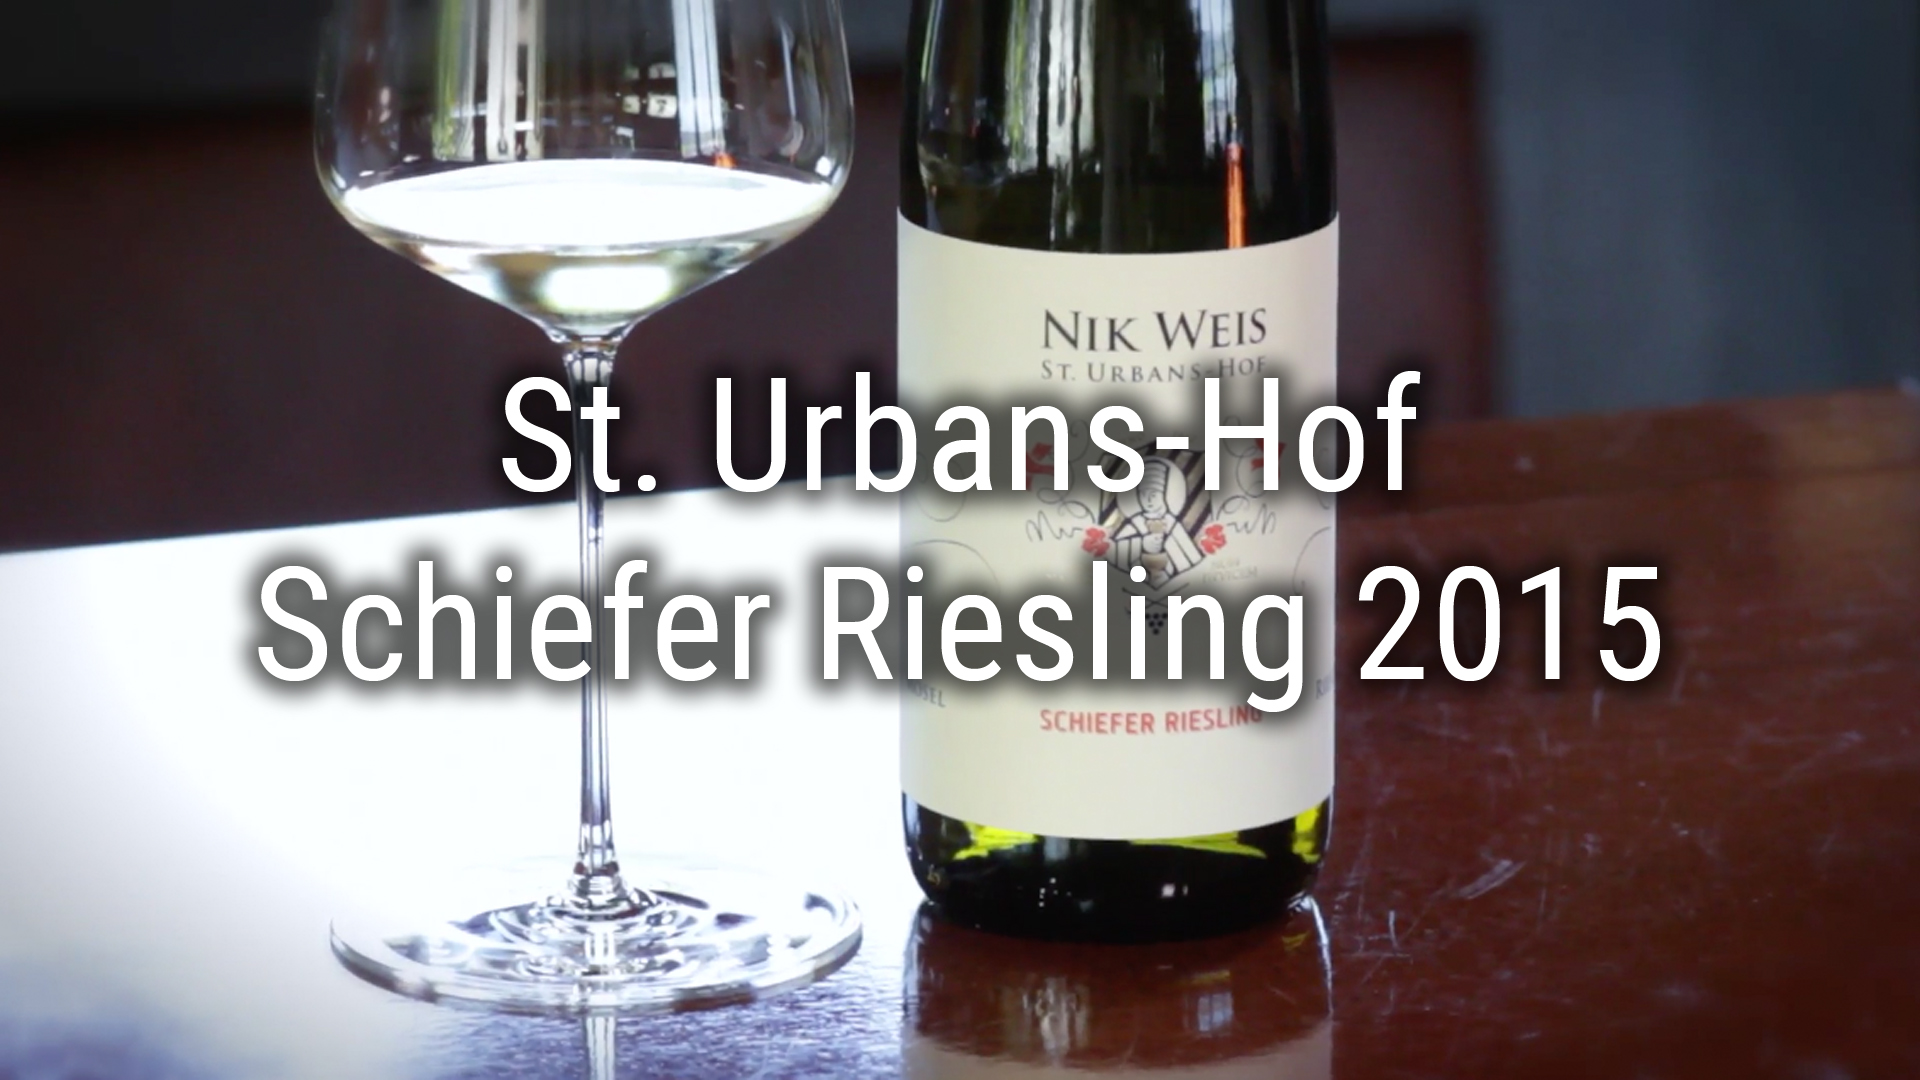 St. Urbans-Hof – Schiefer Riesling 2015